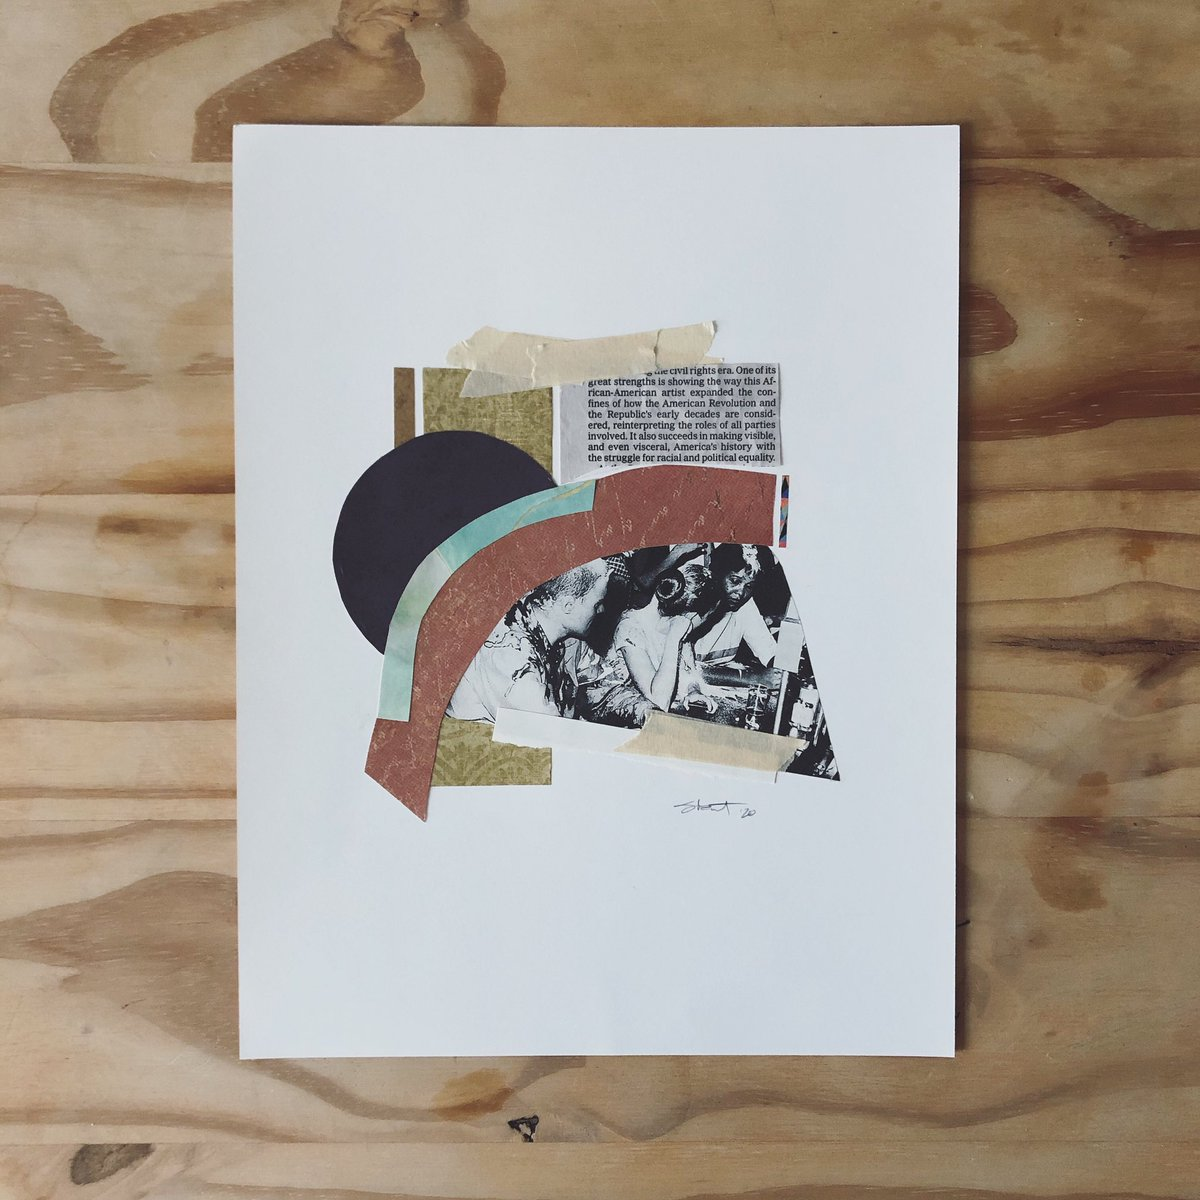 Sit | In  #collage #artoftheday #quarantineart #scrapbookpaper #abstract #abstractart #newspaper #sitin #civildisobedience #resist #revolution #civilrights https://t.co/VTPMZFfw43